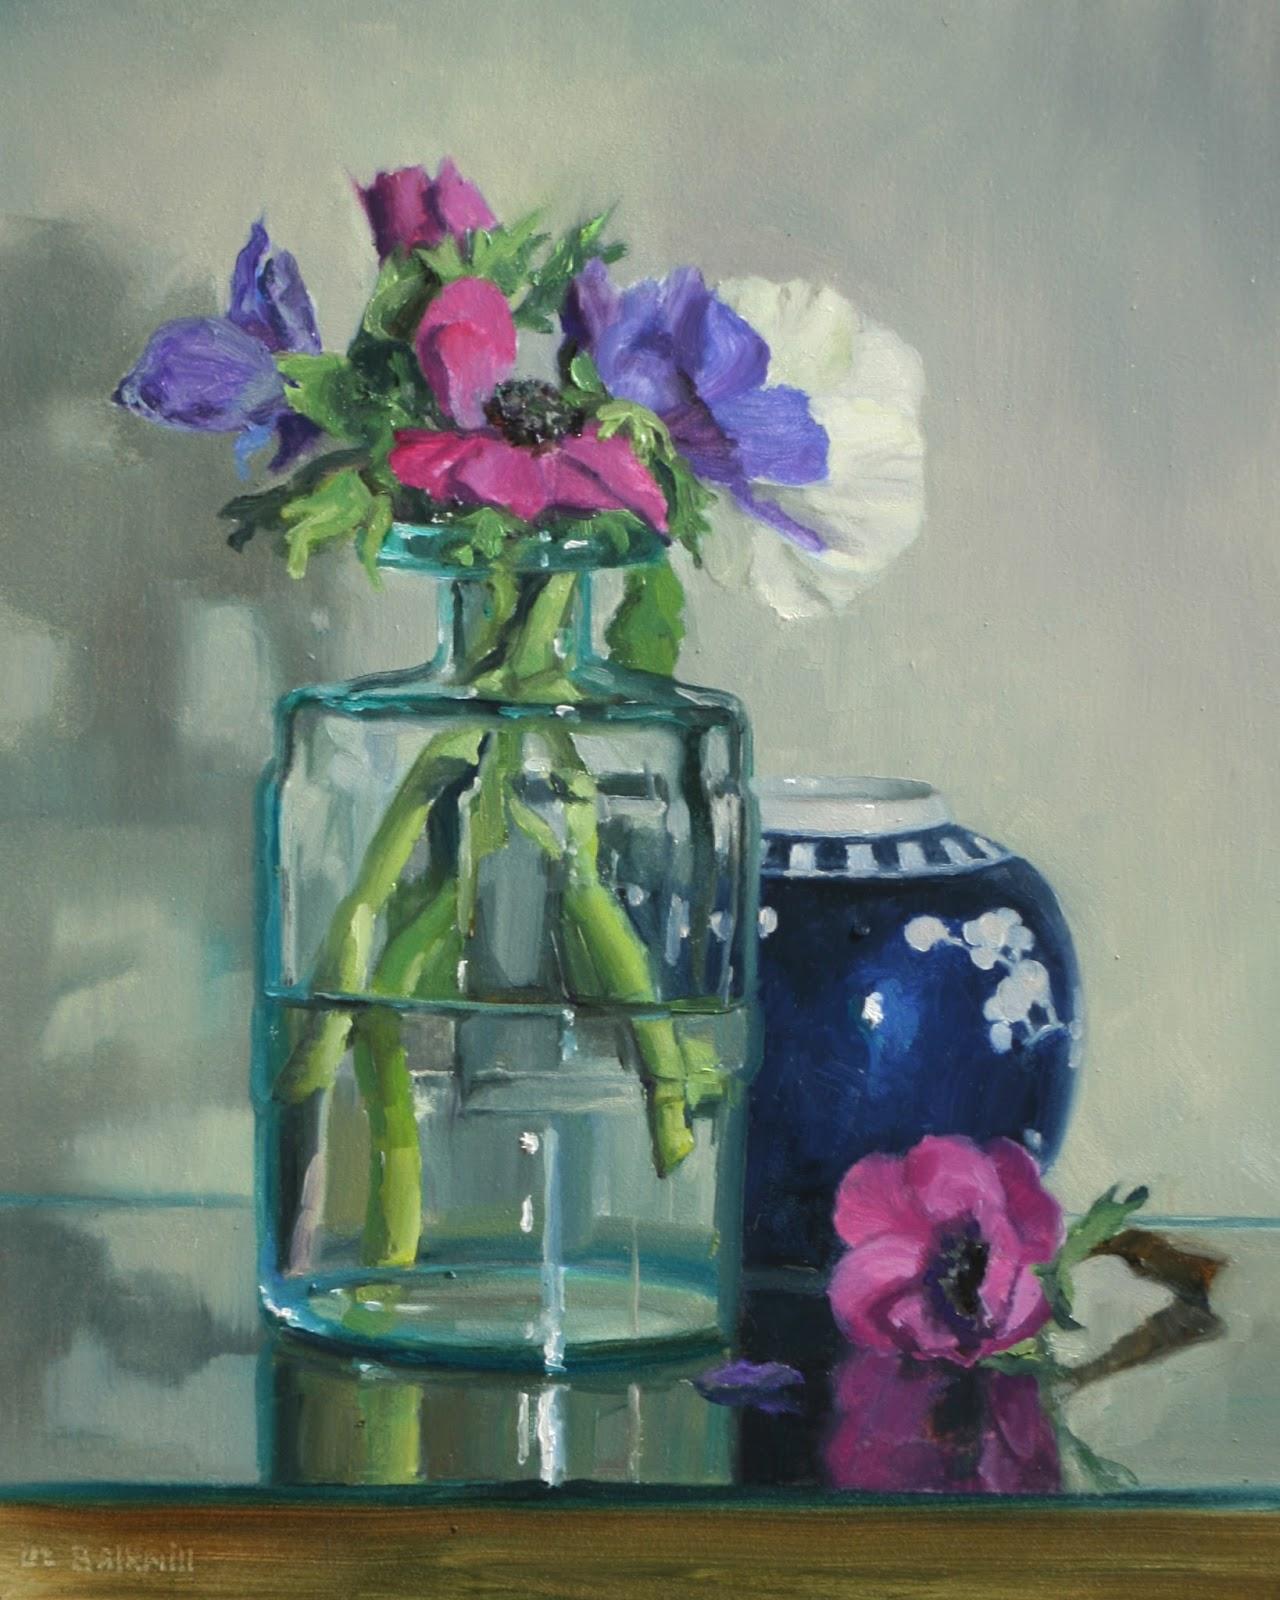 Anemones in glass jar - Pastel